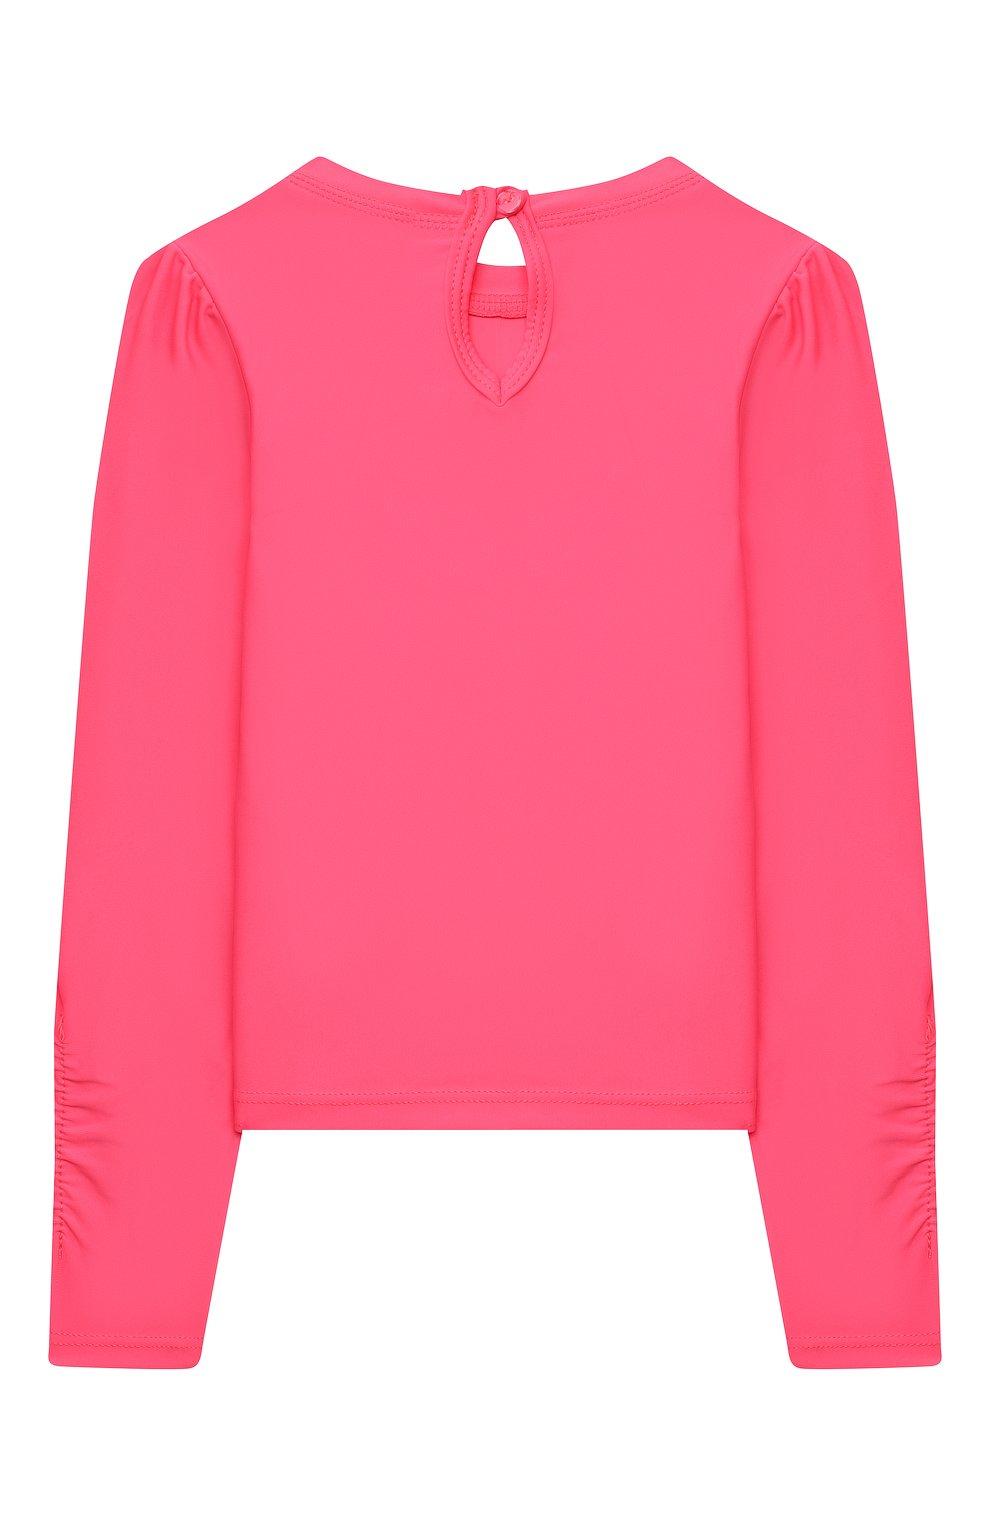 Детского комплект для плавания SNAPPER ROCK розового цвета, арт. G52010L   Фото 3